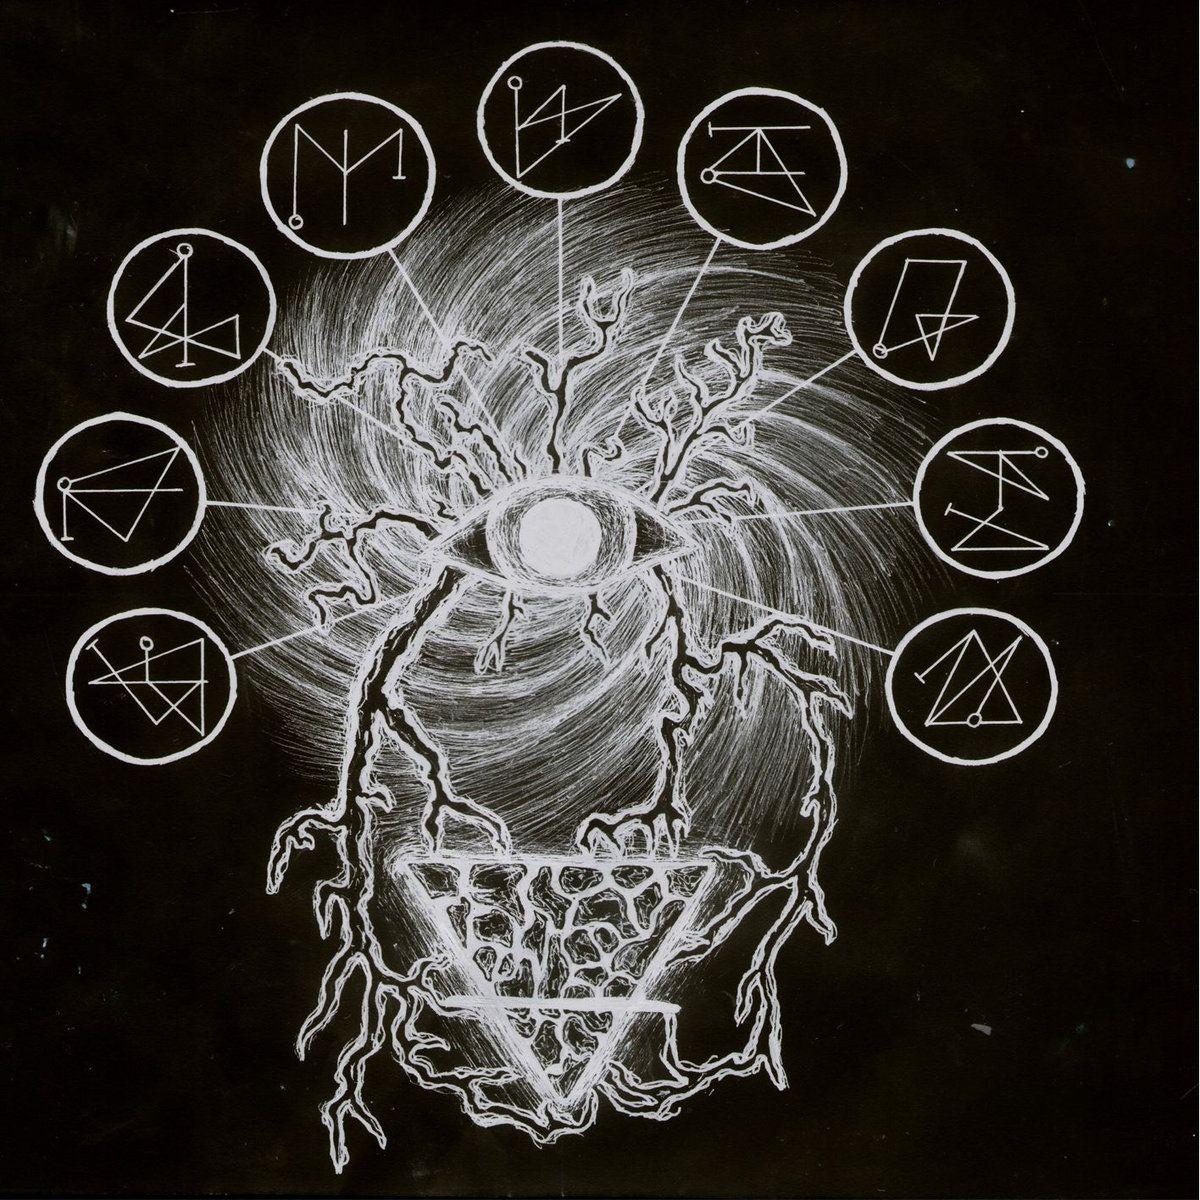 Todesfall - Nine Books of Cosmic Antebellum